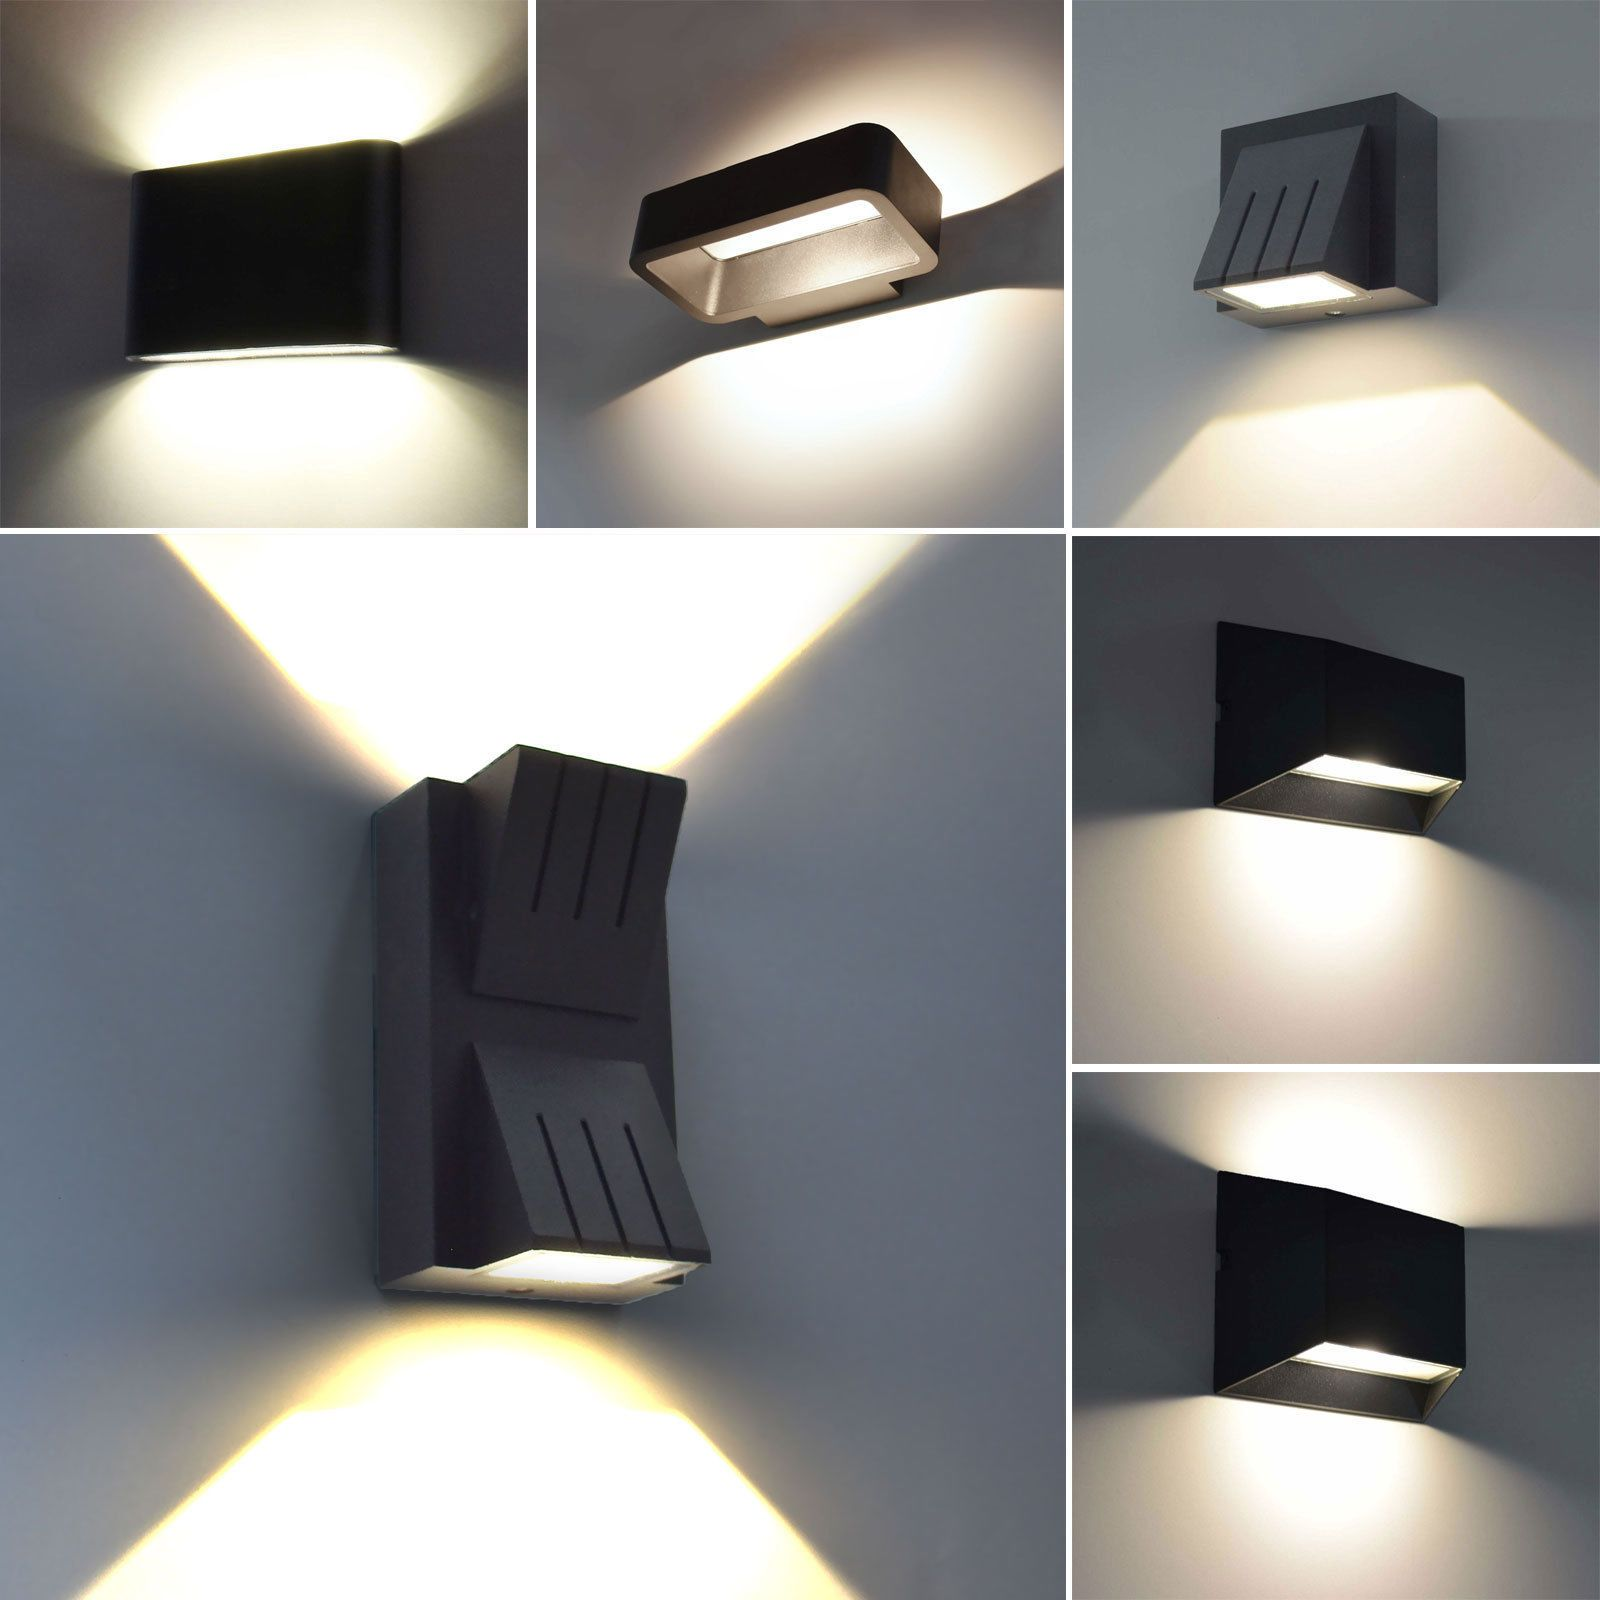 Moderne Led Aussenleuchte Wandleuchte Aussenlampe Up Down Lampe Leuchte Schwarz Ebay Aussenlampe Beleuchtung Decke Wandleuchte